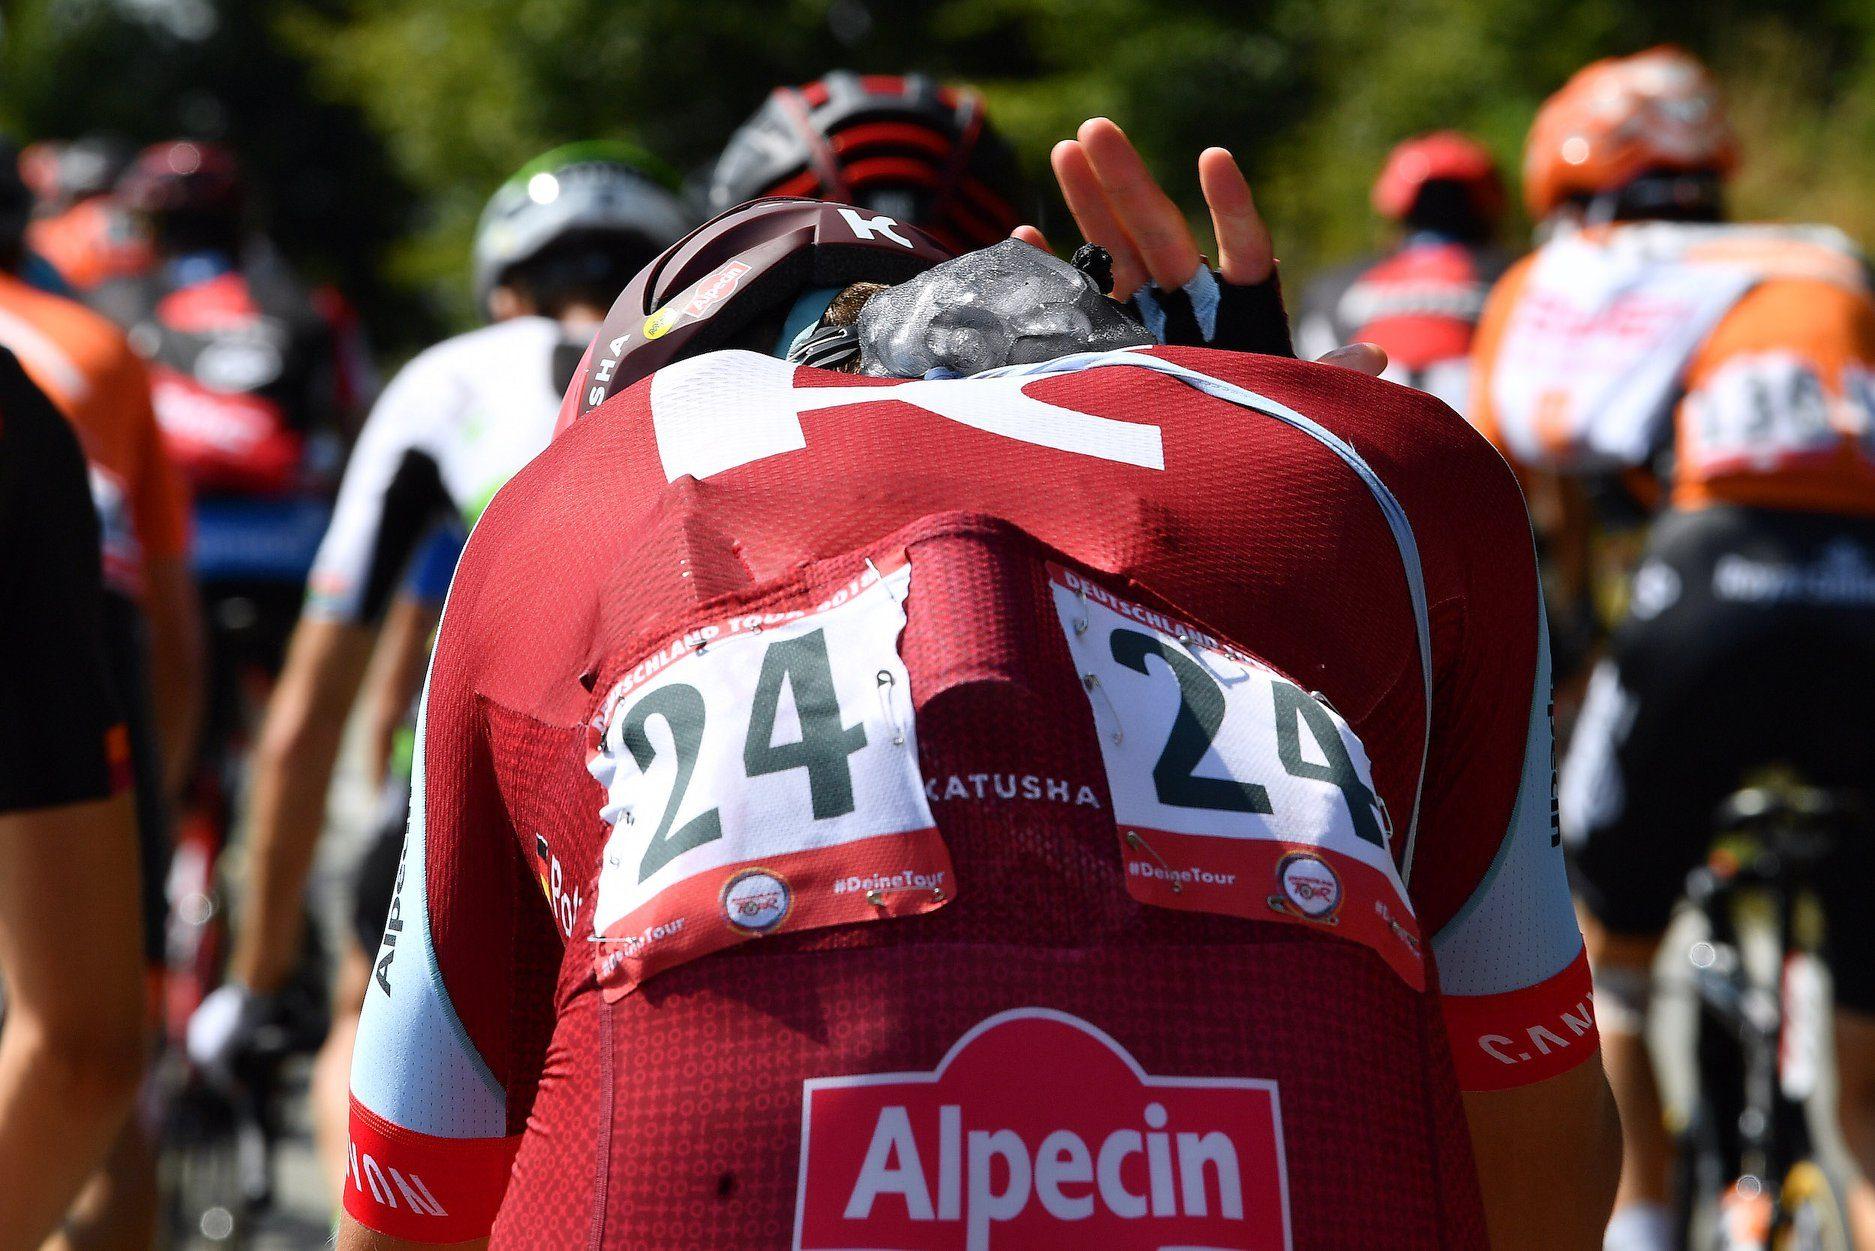 Team Katusha — Alpecin